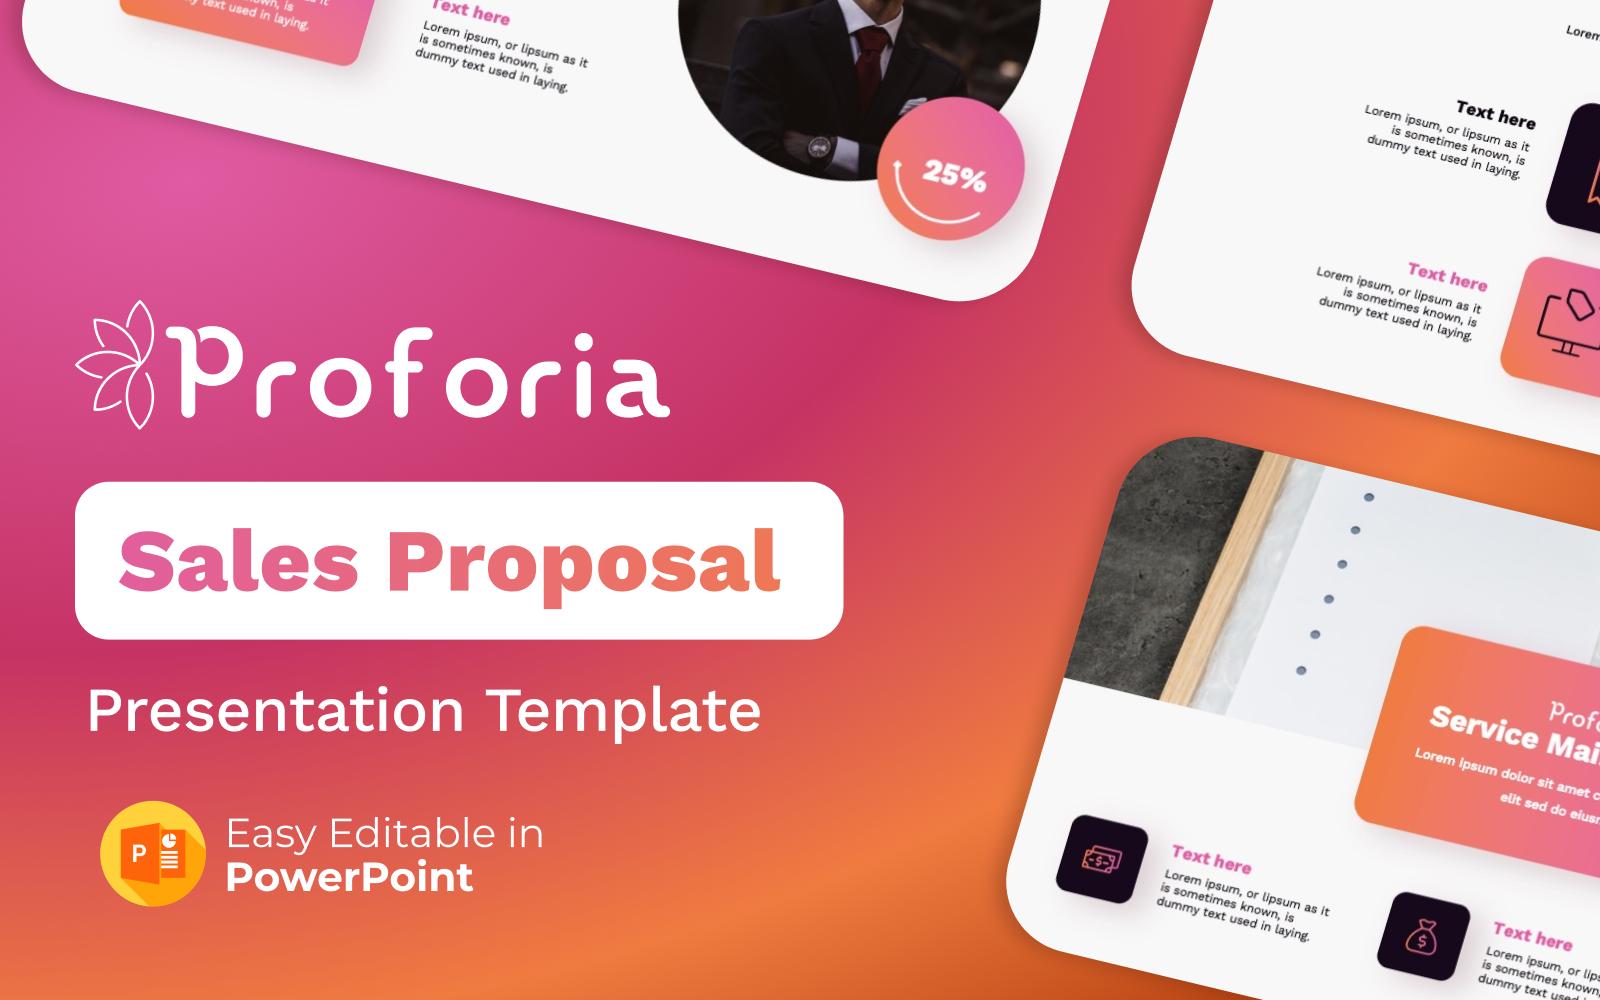 Proforia – Sales Proposal PowerPoint Presentation Template